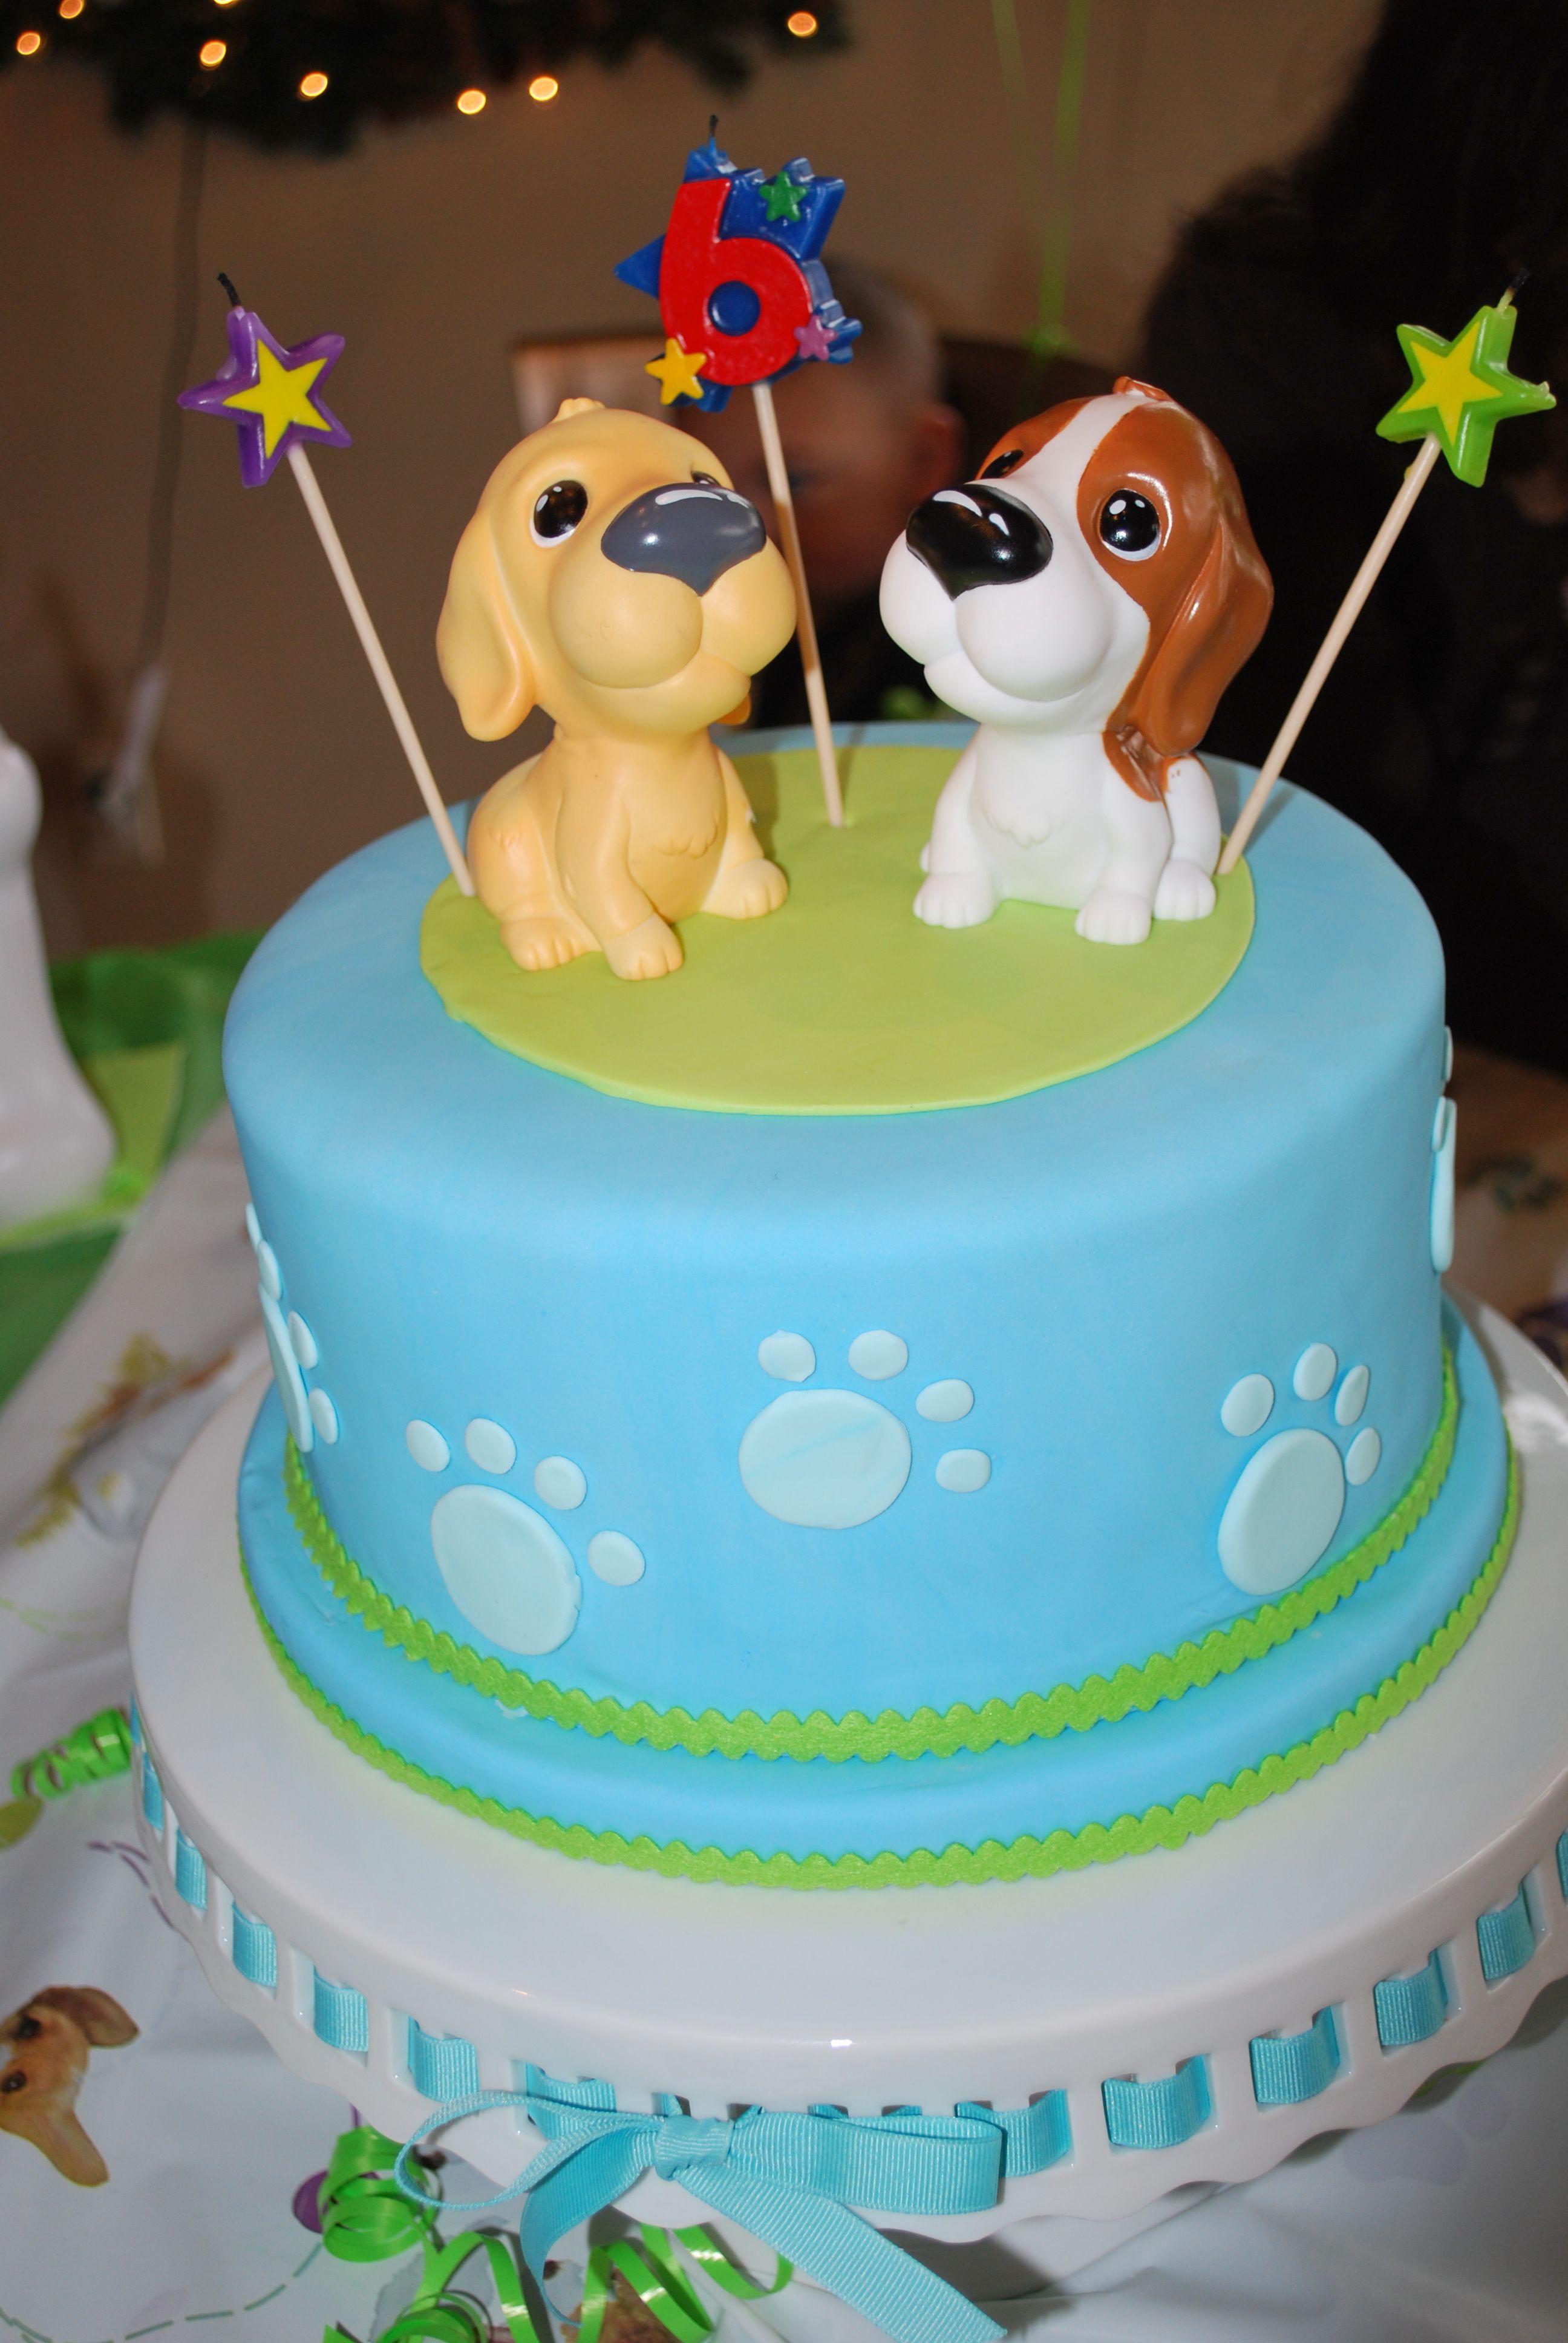 Puppy Dog Cake Design : Dog Cake Ideas 22911 Puppy Cake Birthday Ideas Pinterest